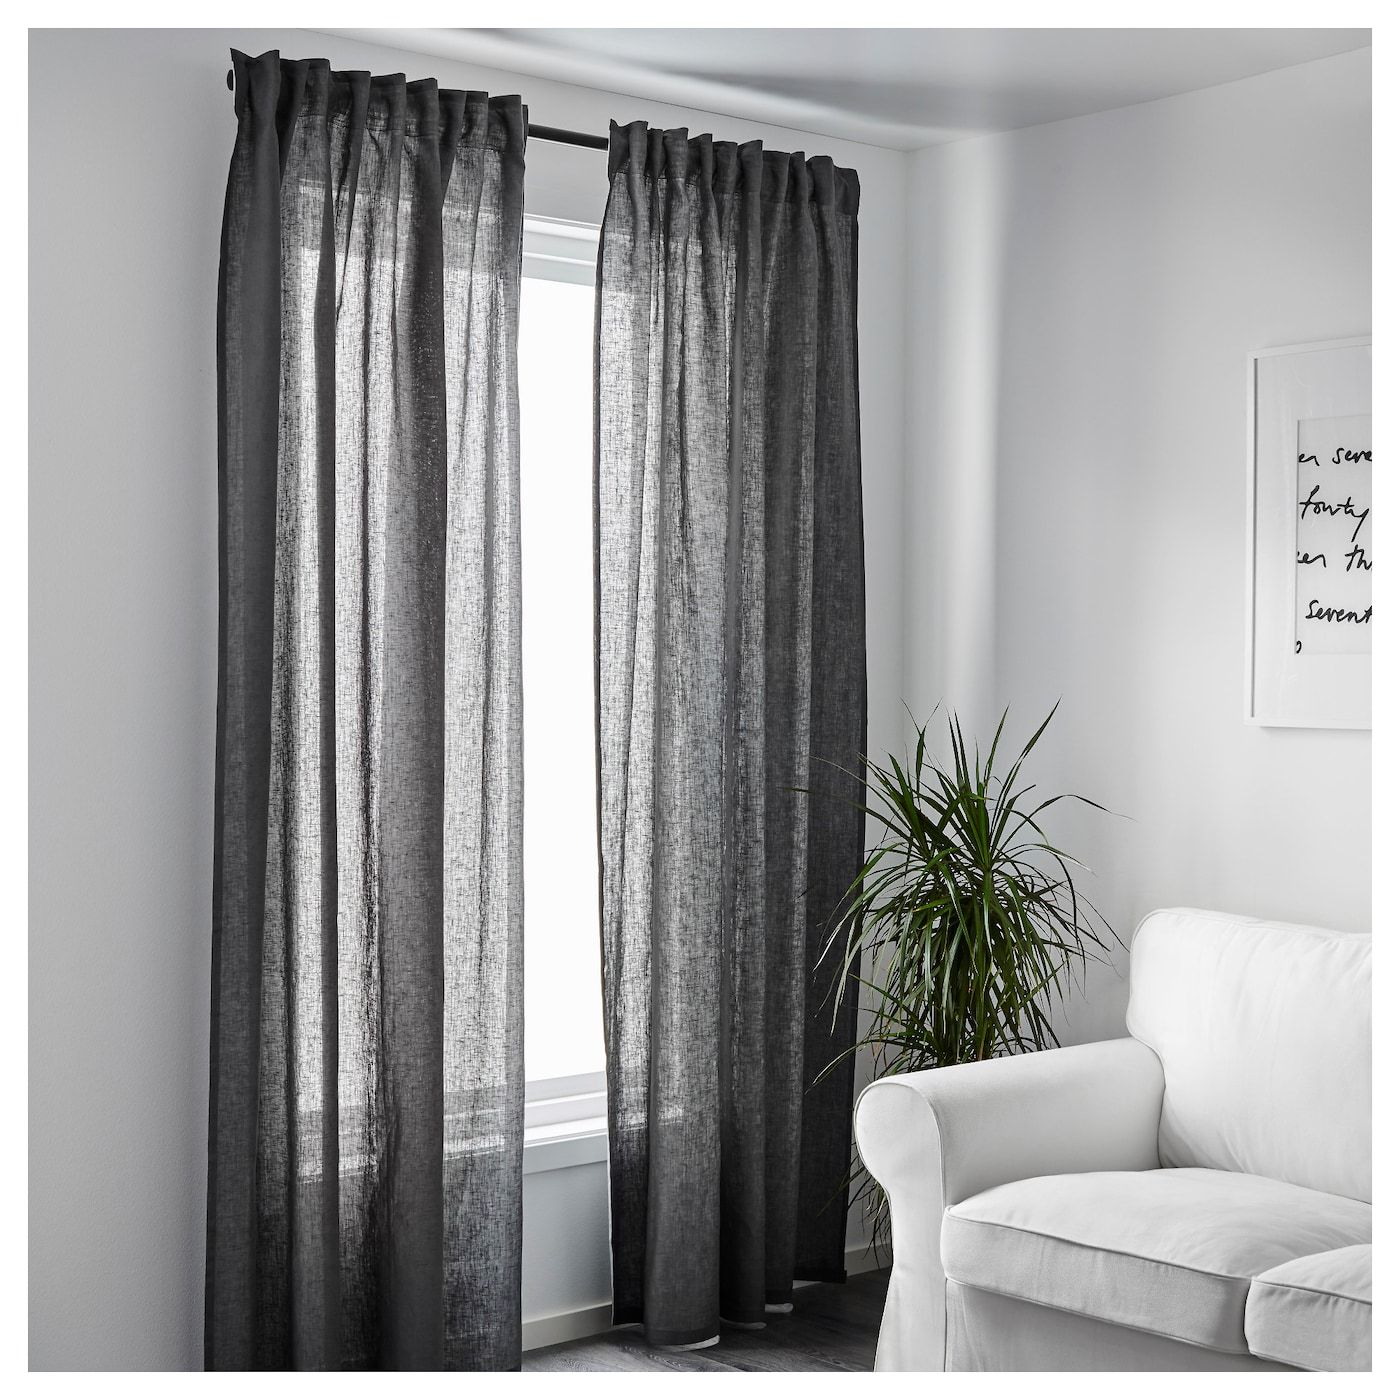 Ikea Aina Curtains 1 Pair Dark Gray Grey Curtains Living Room Dark Grey Curtains Dark Curtains